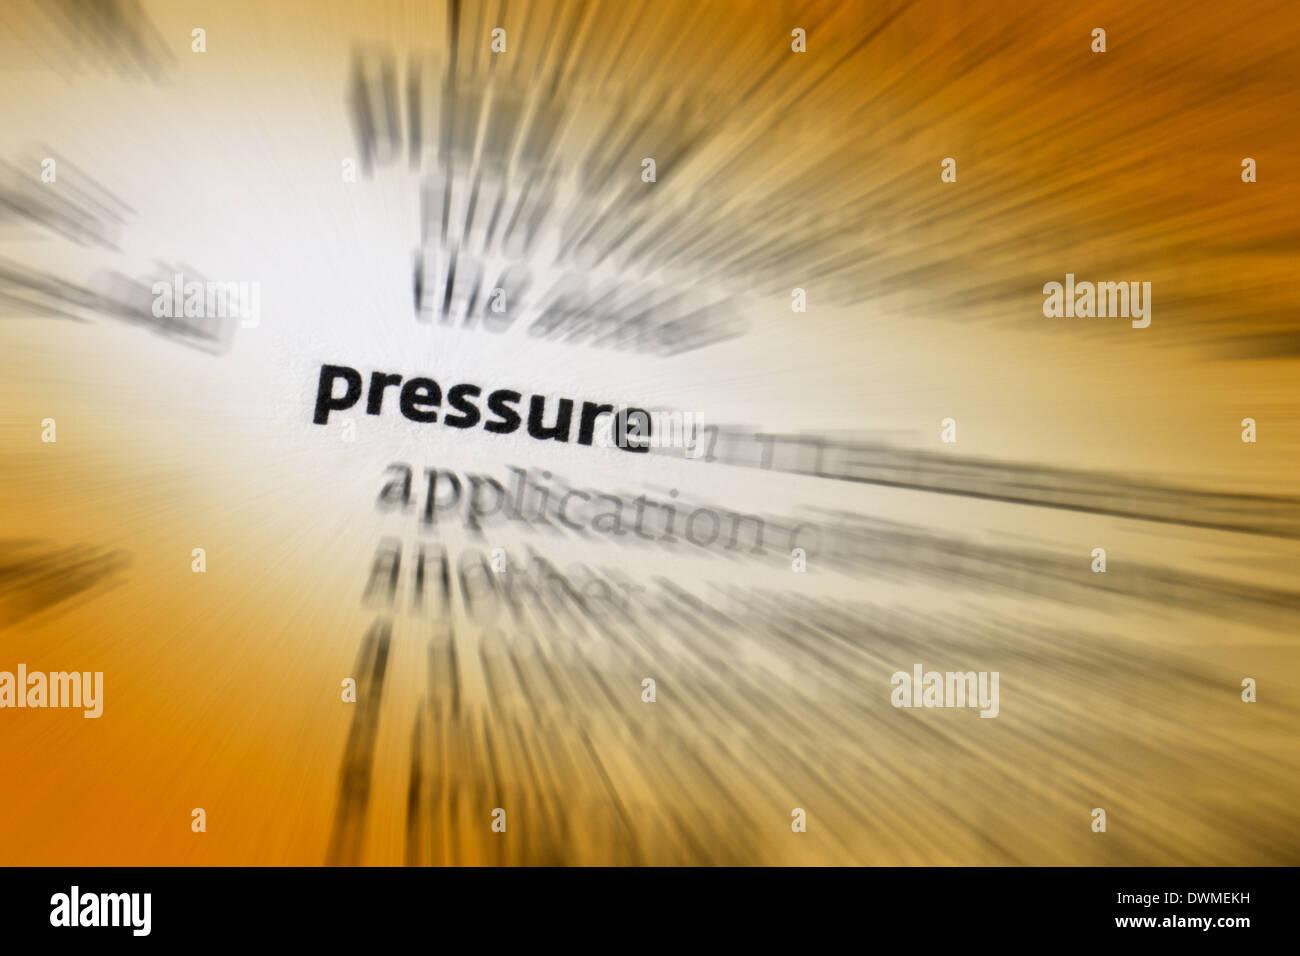 Pressure - Stock Image